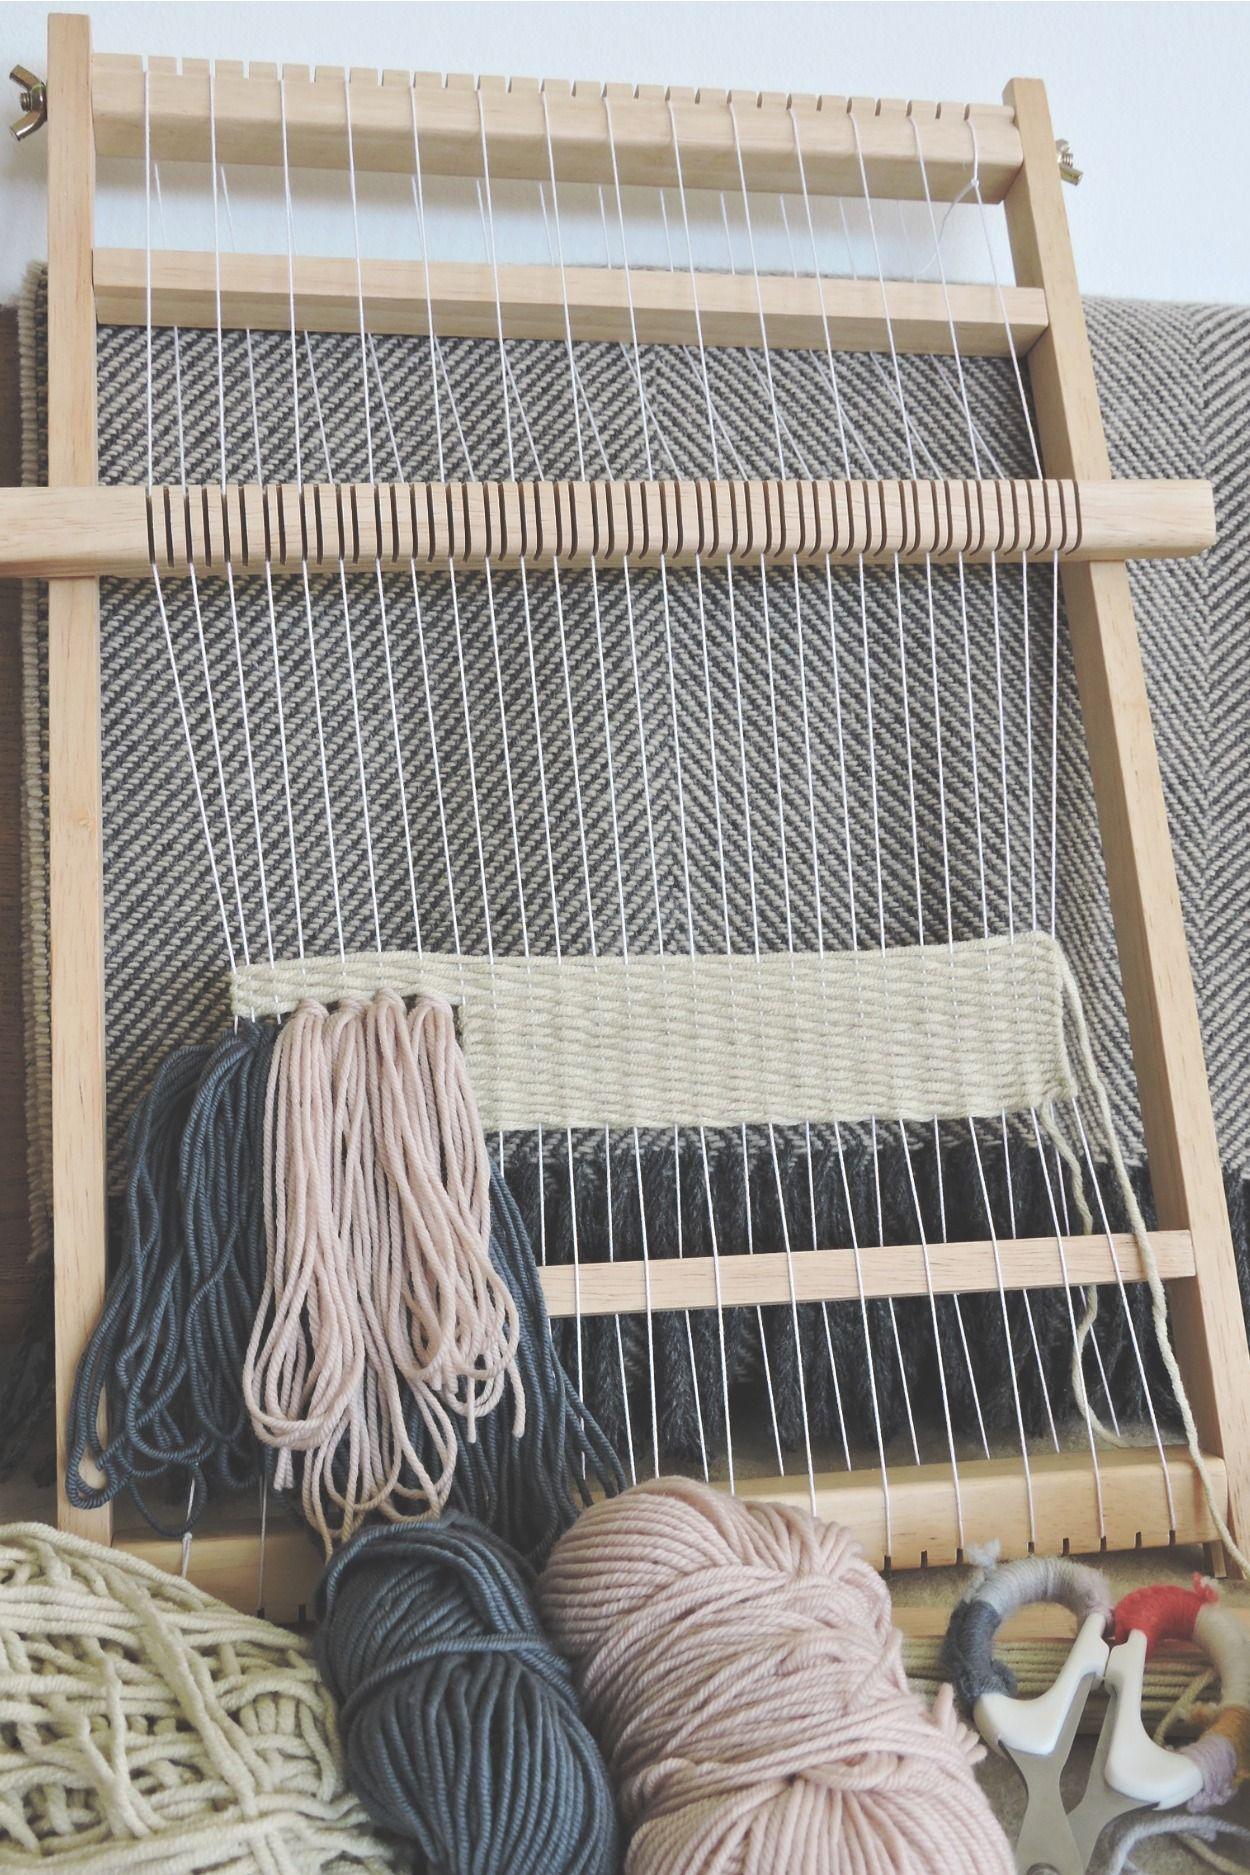 Smitten Weaving   crafts and children's art lessons   Weaving, Loom